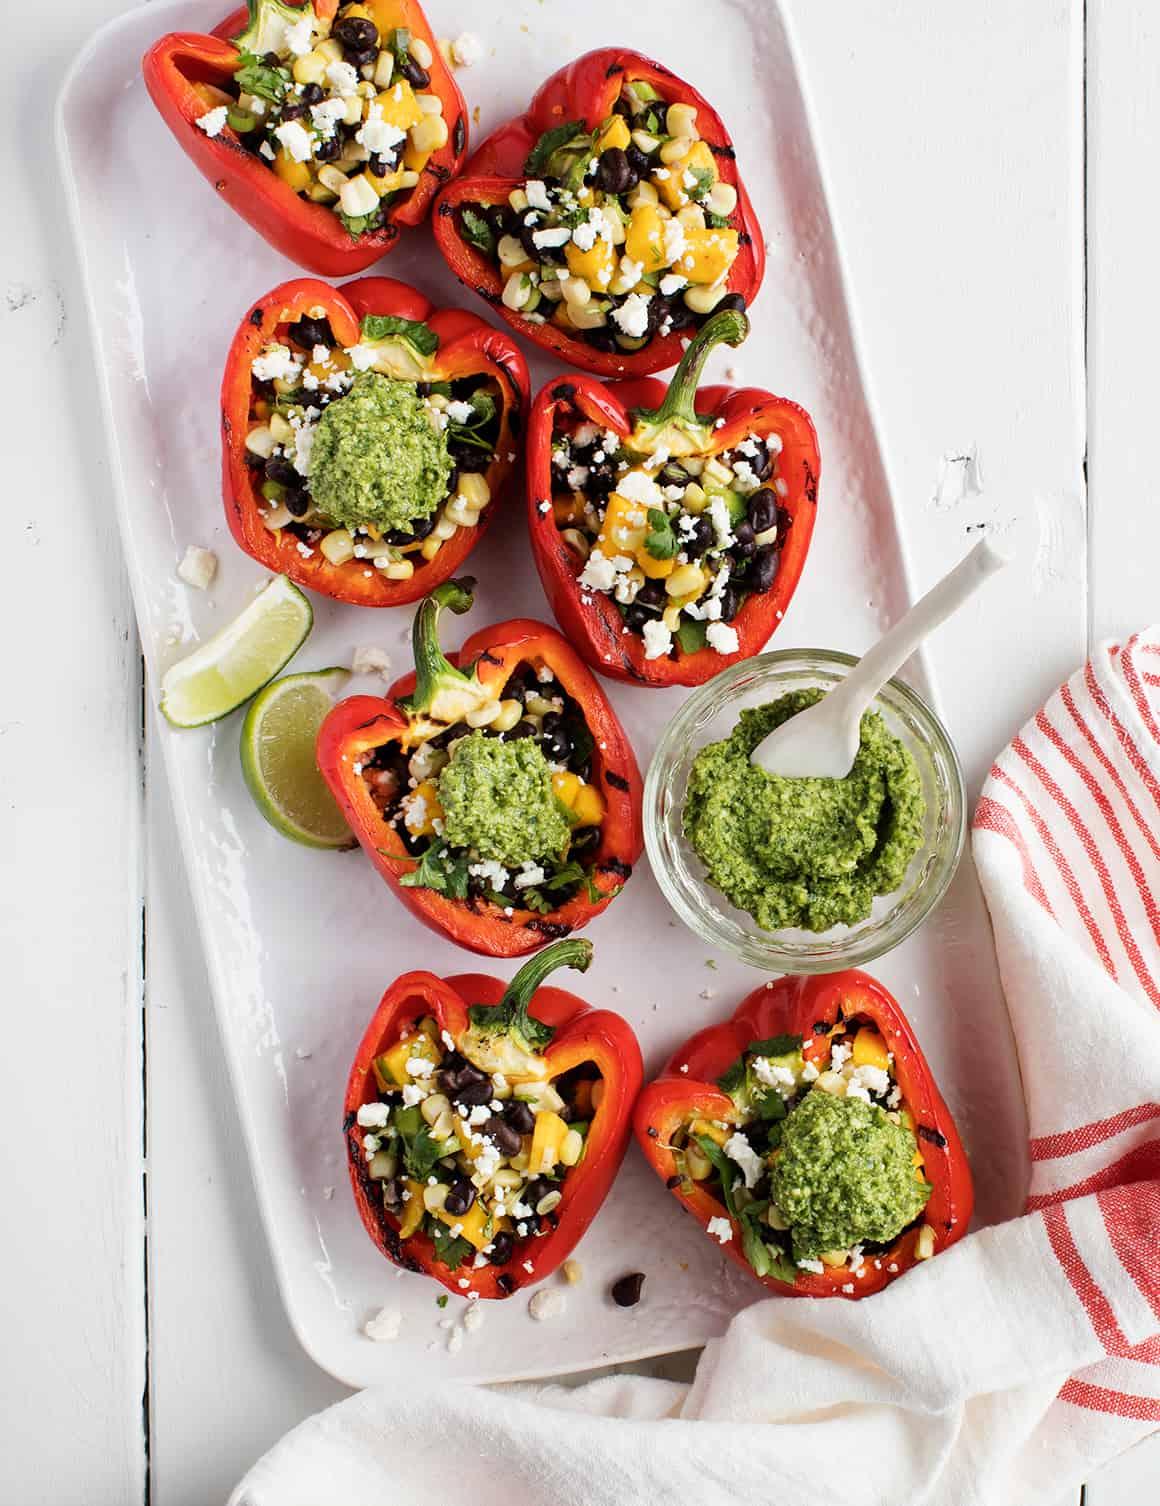 Best grill recipes - Vegan Burrito Bowl